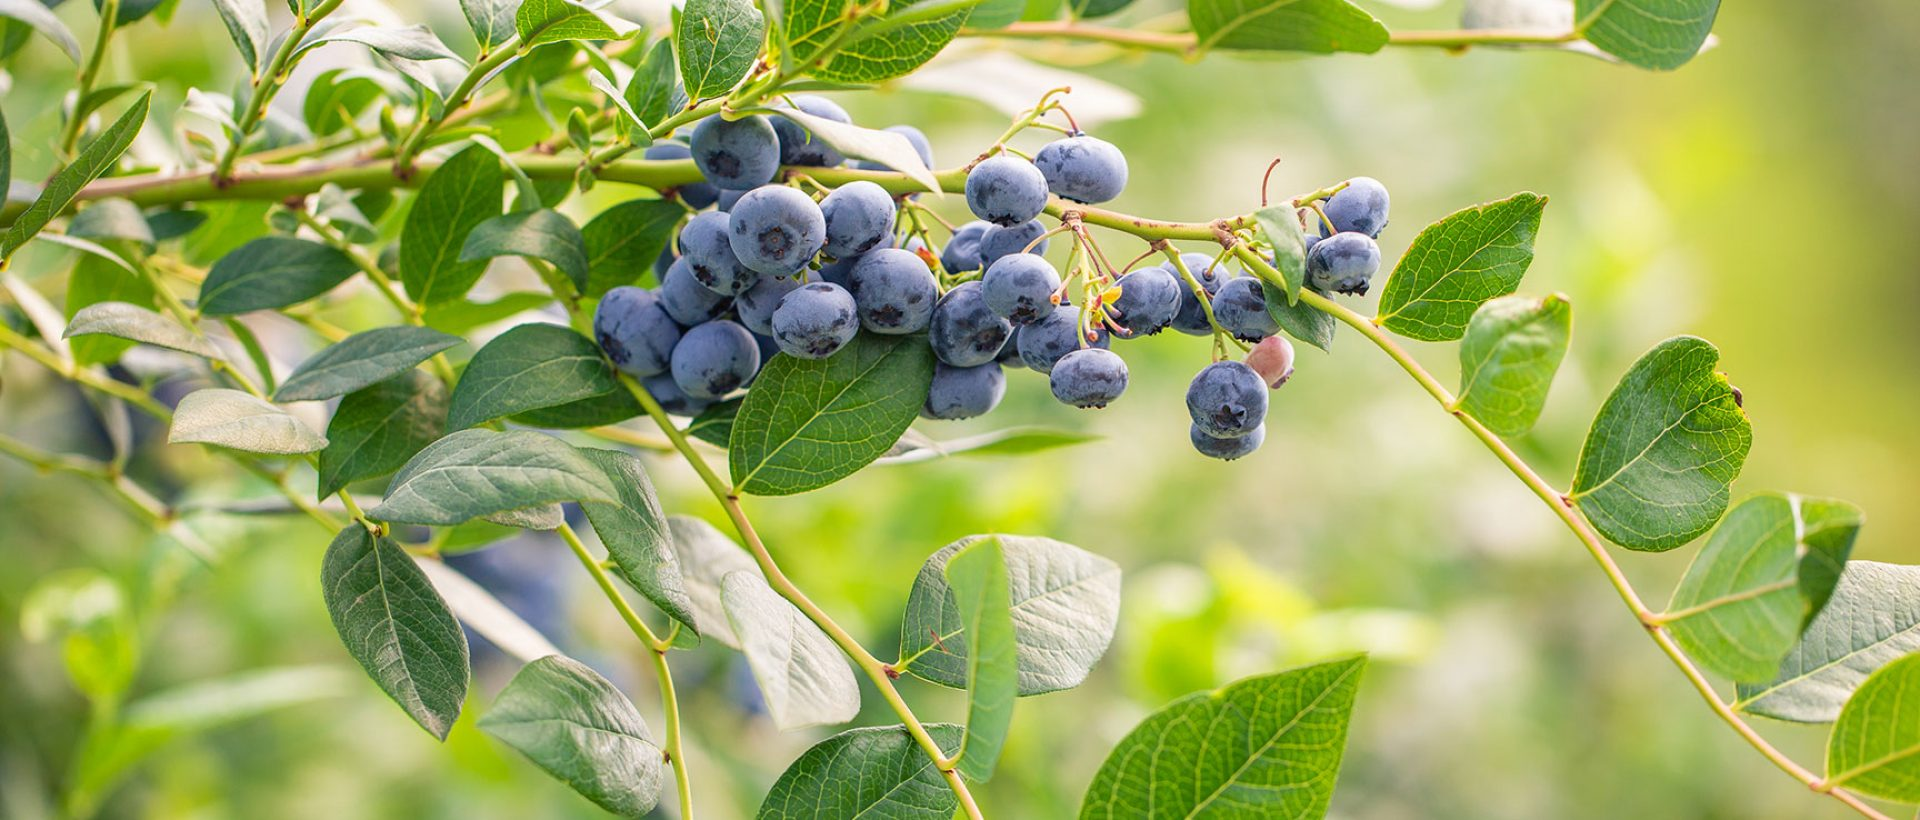 nxtagro-09abr21-berries3